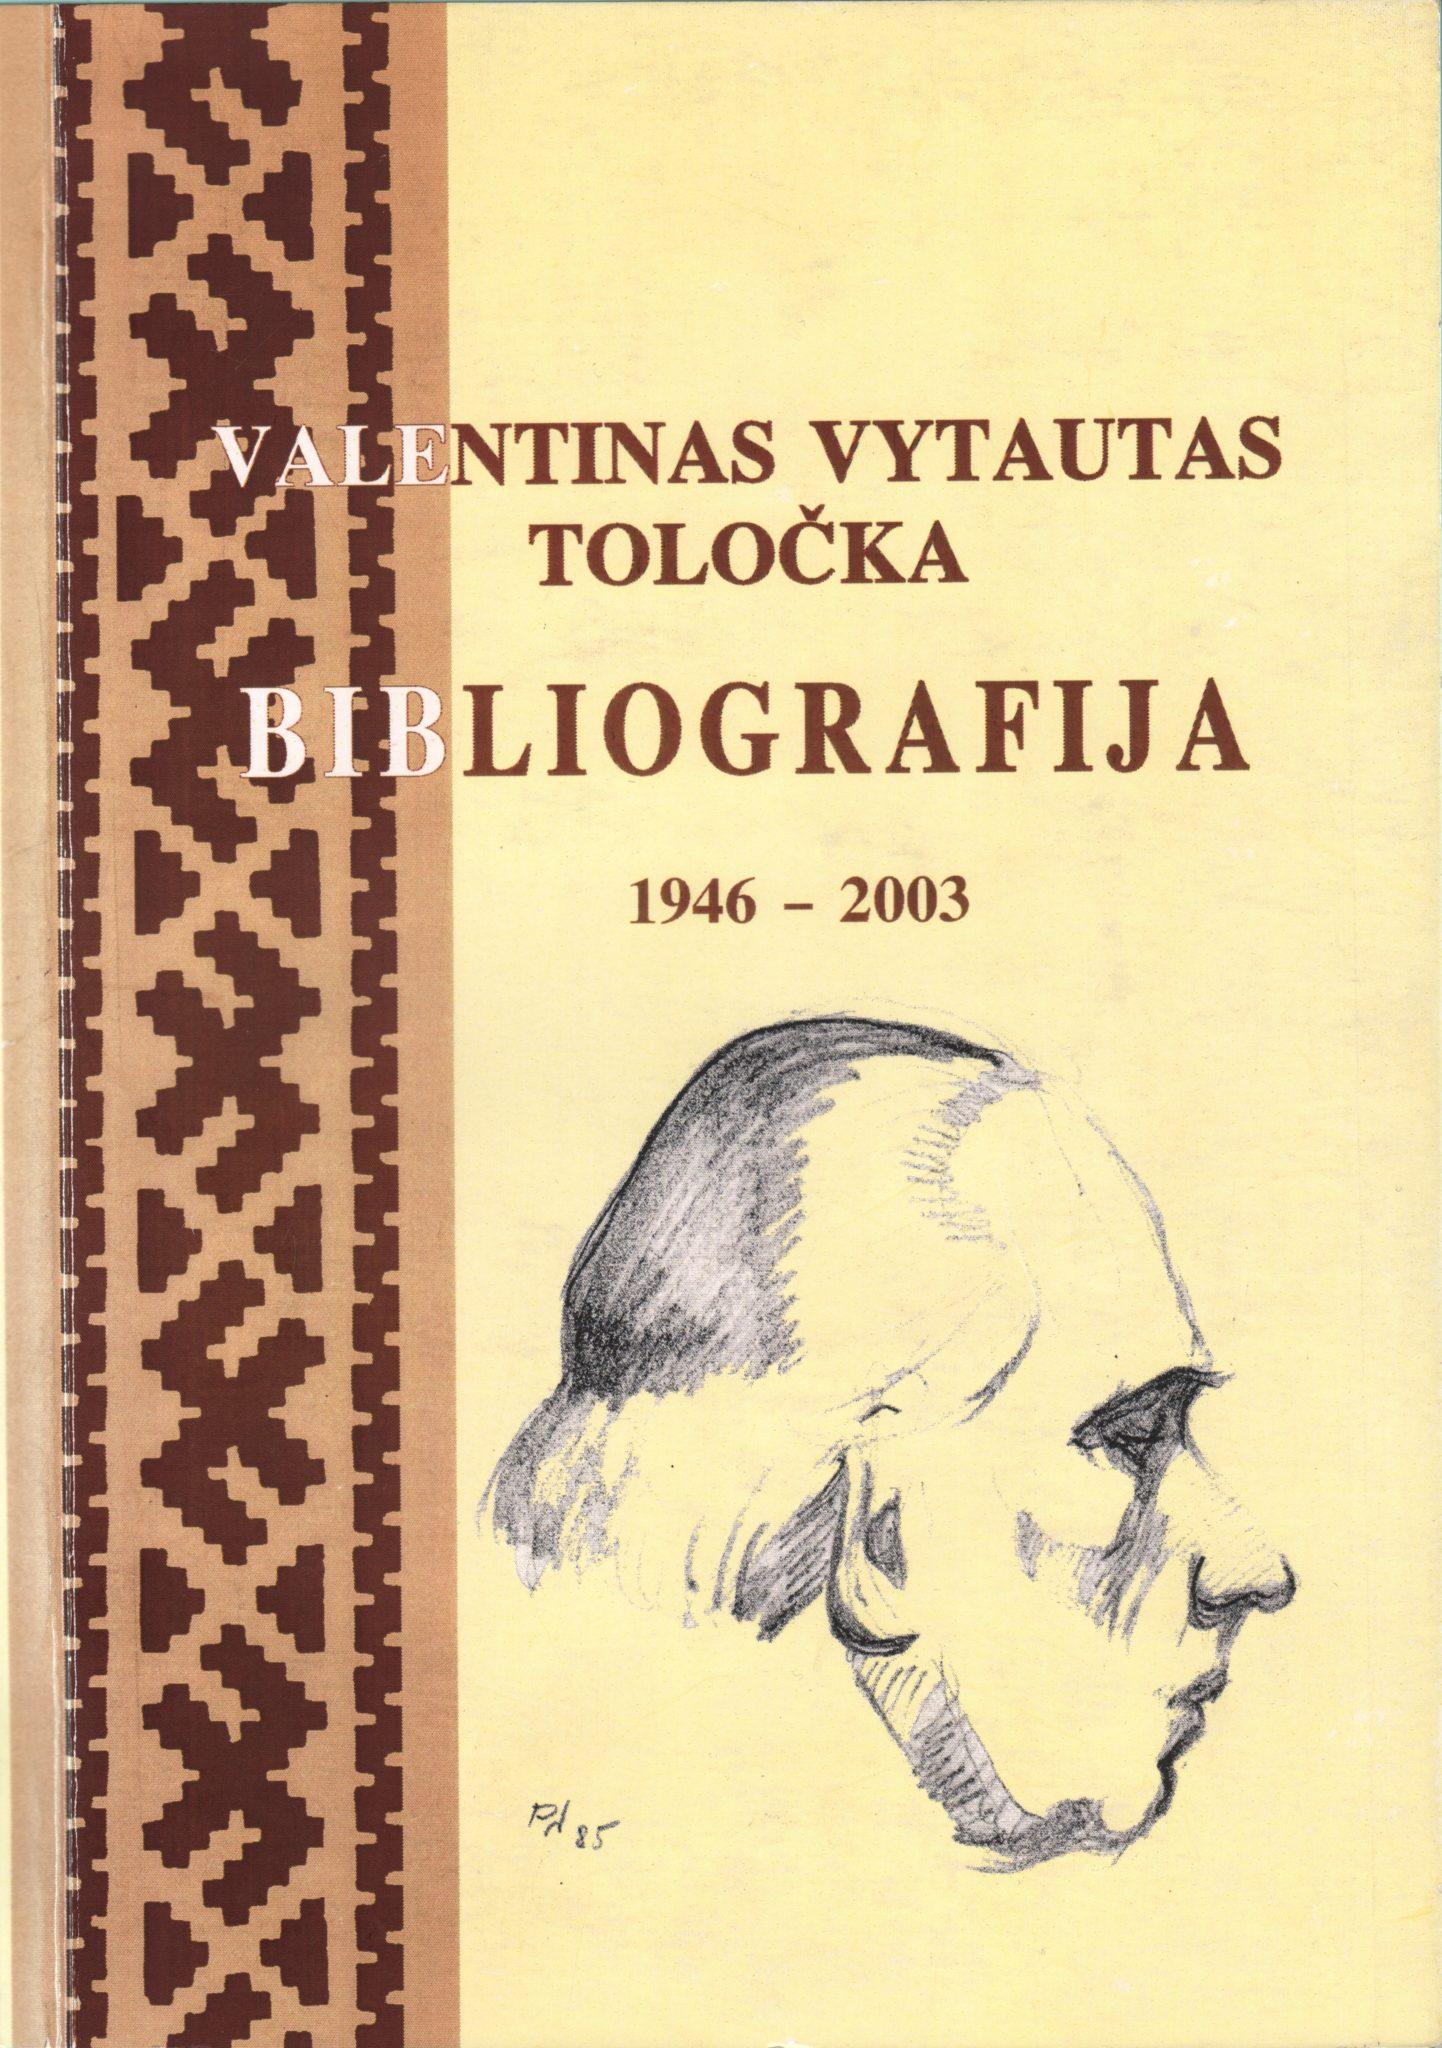 V. V. Toločka: bibliografija, 1946–2003. – Vilnius, 2004. Knygos viršelis.